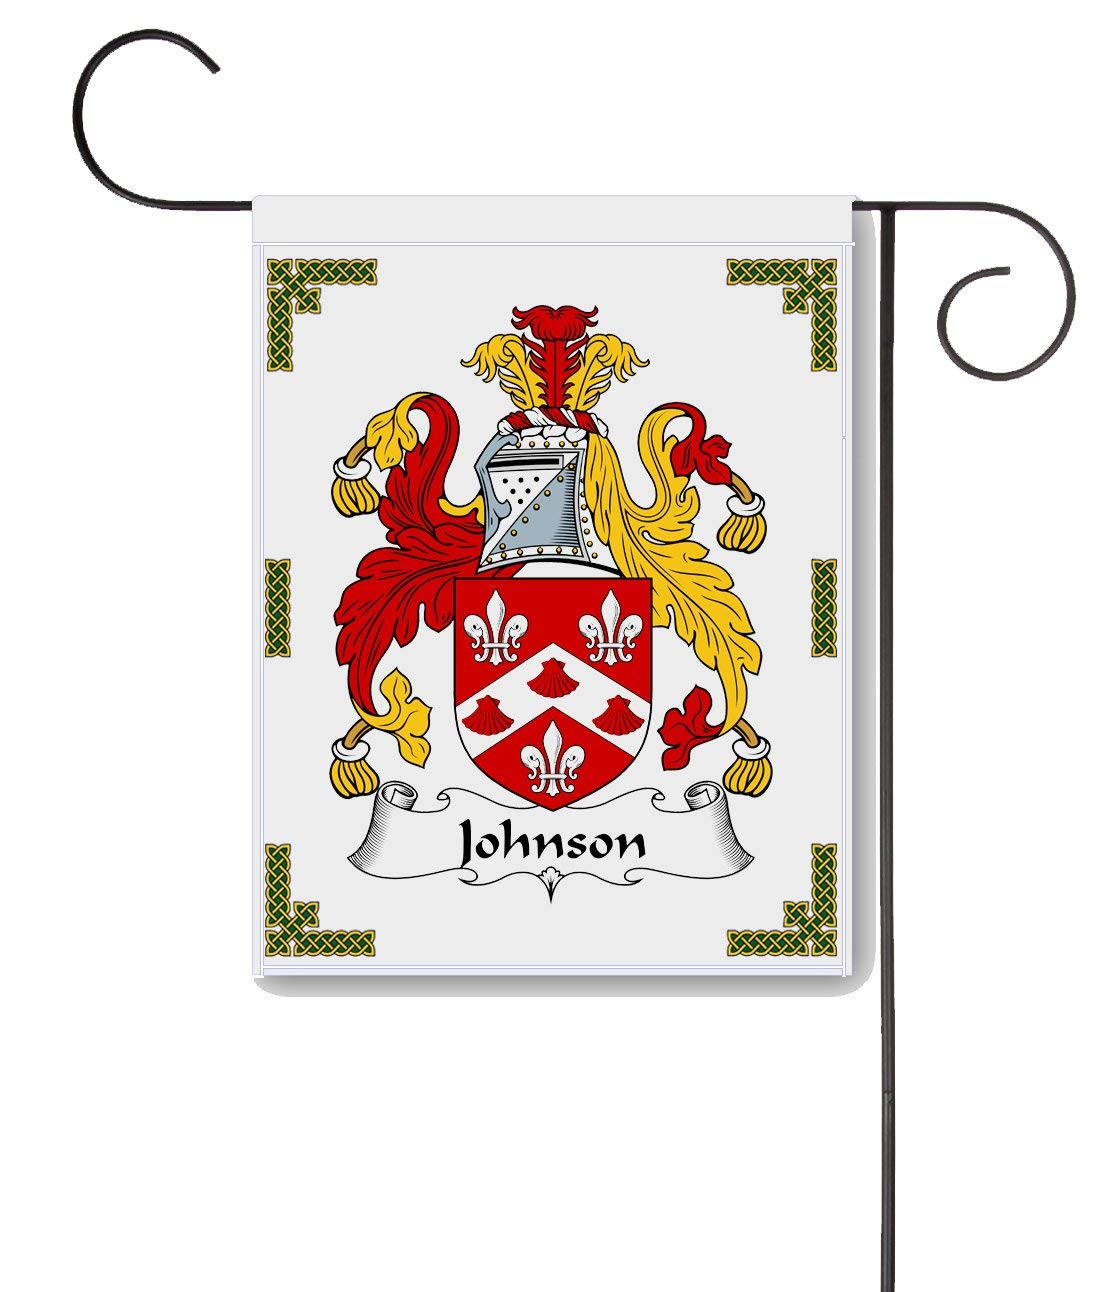 Cheap Johnson Family Crest, find Johnson Family Crest deals on line